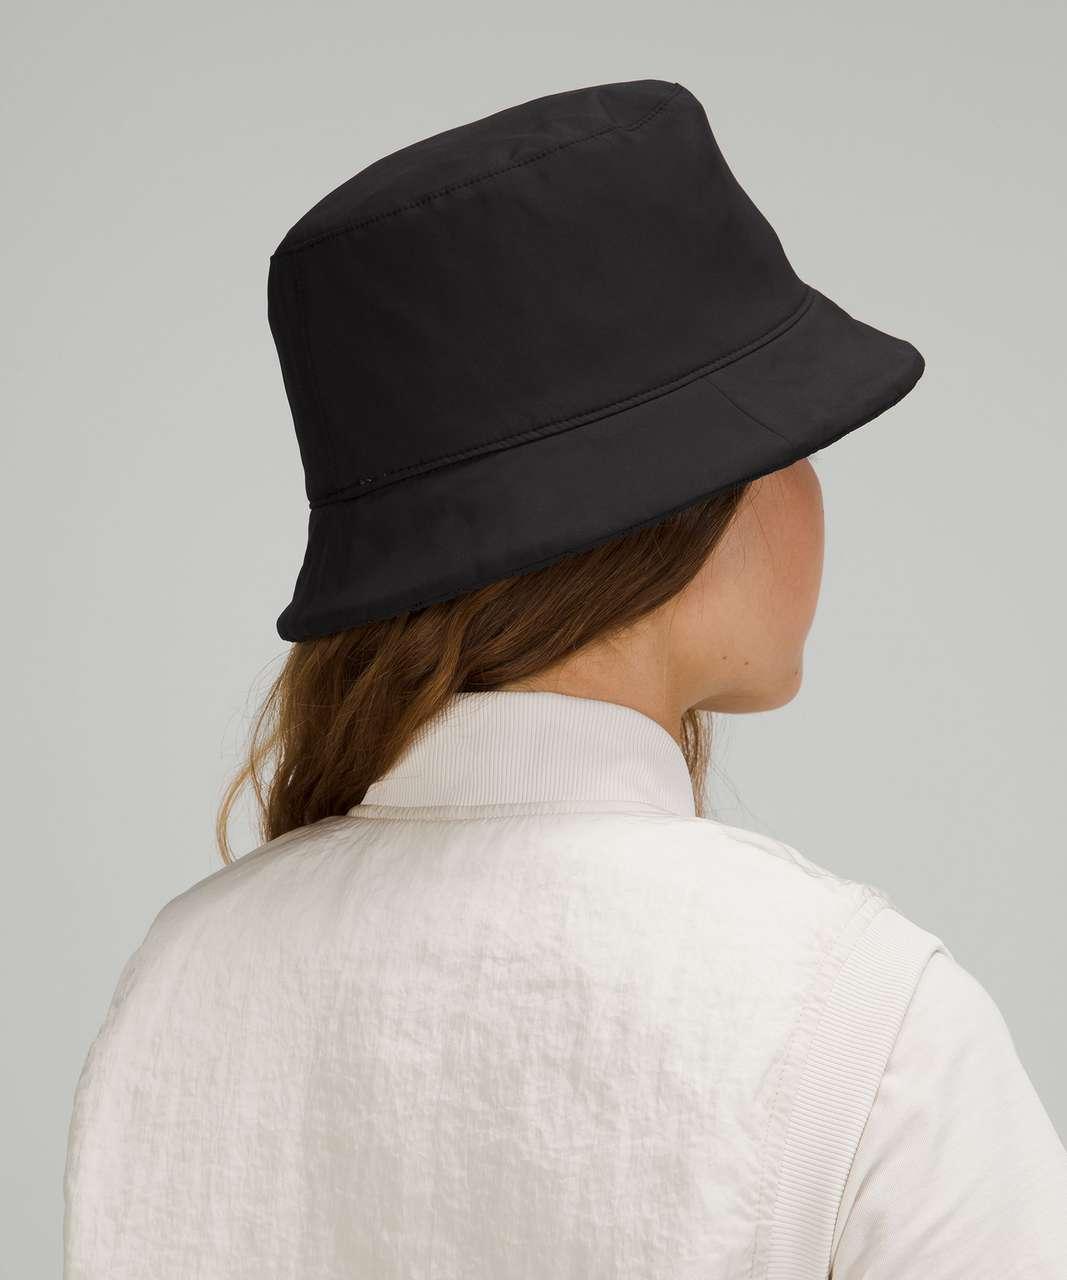 Lululemon Reversible Quilted Bucket Hat - Black